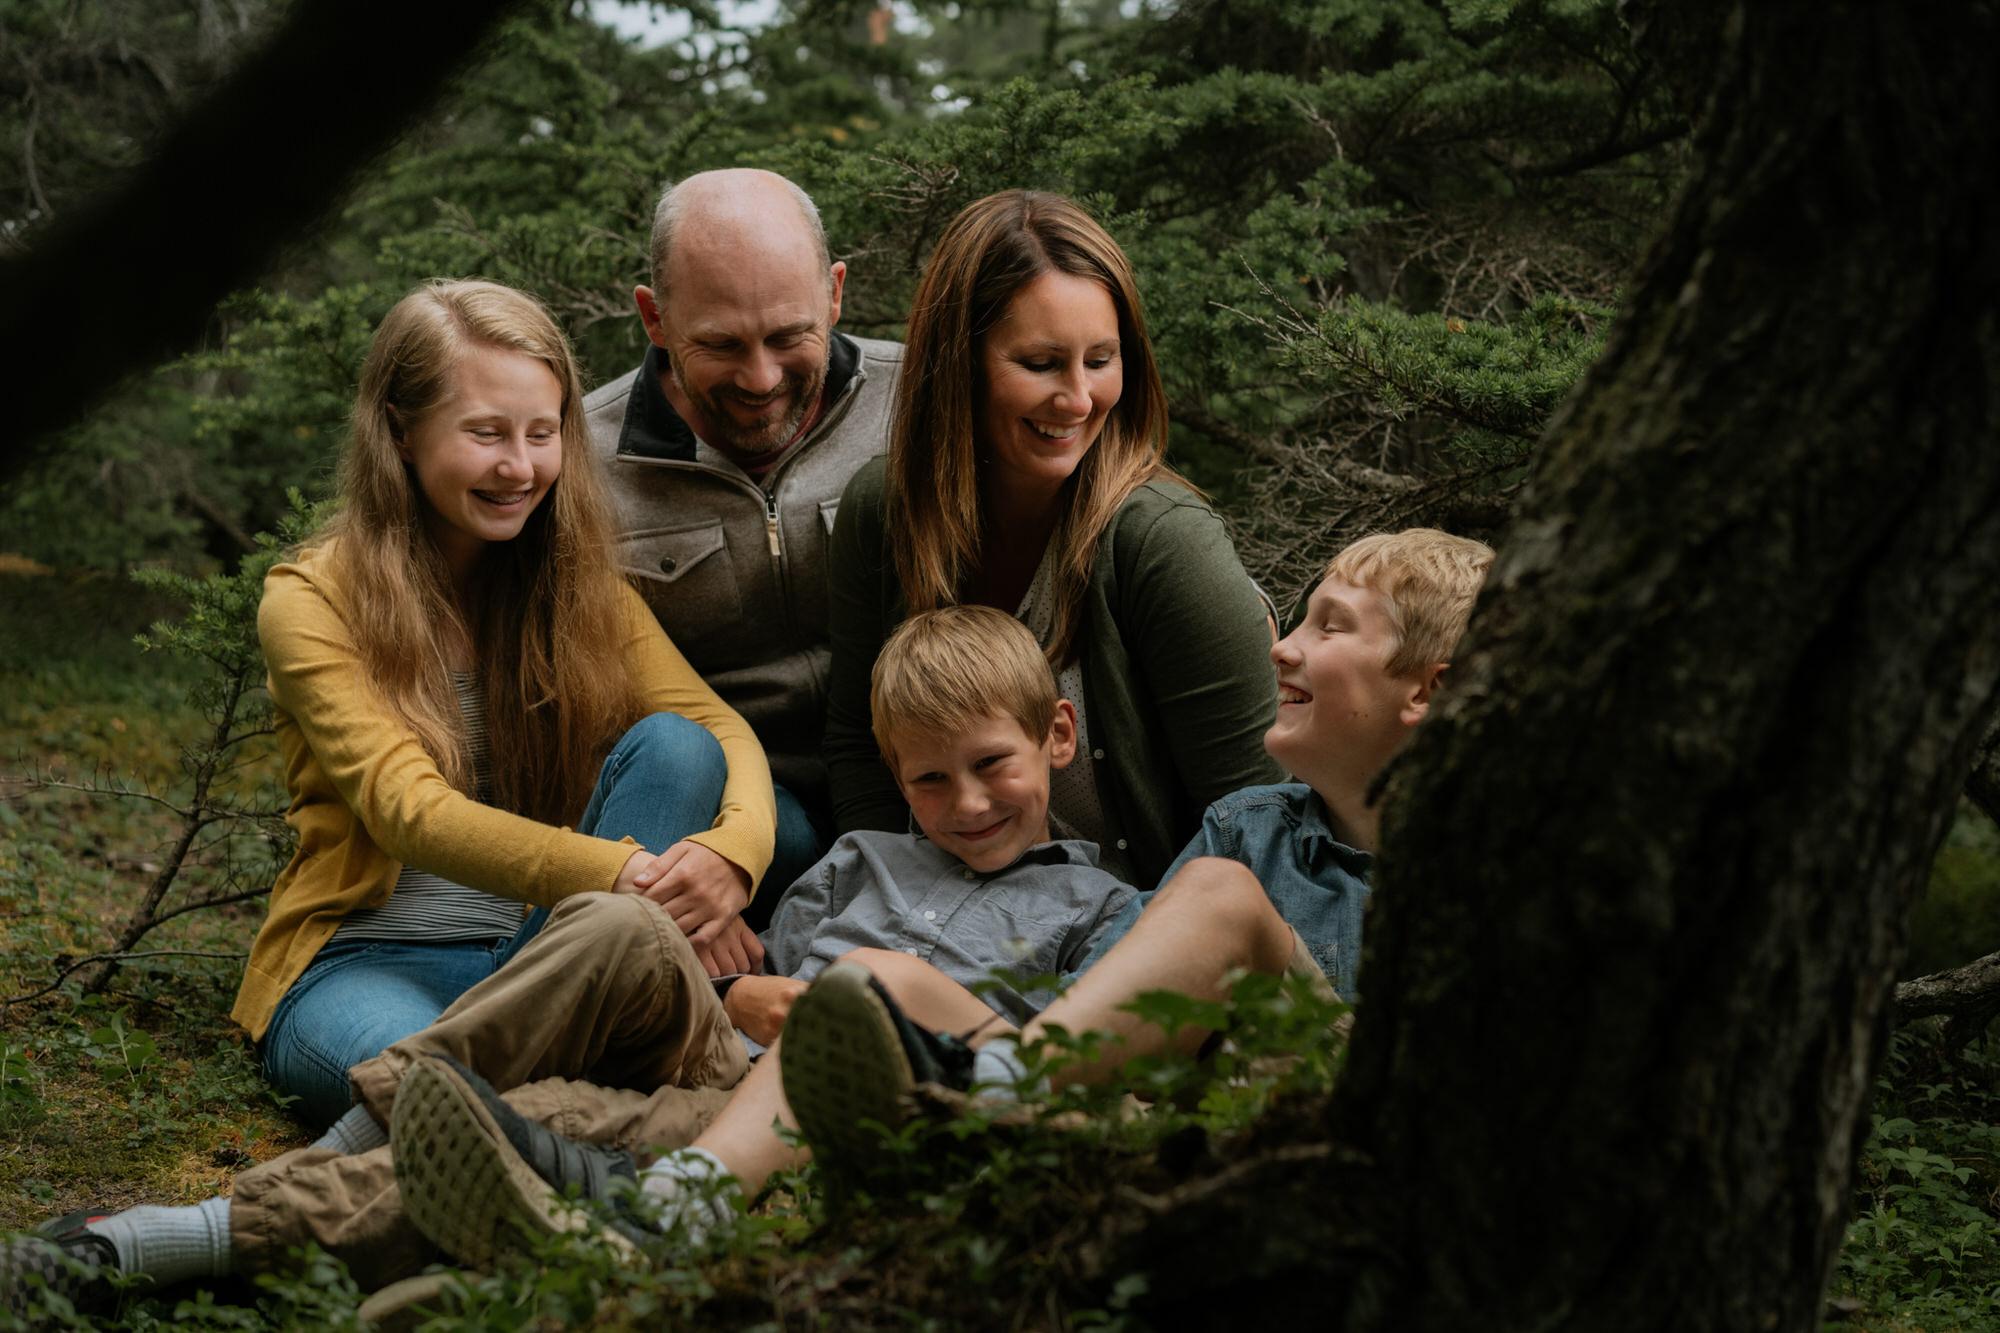 family photographer lexington kentucky